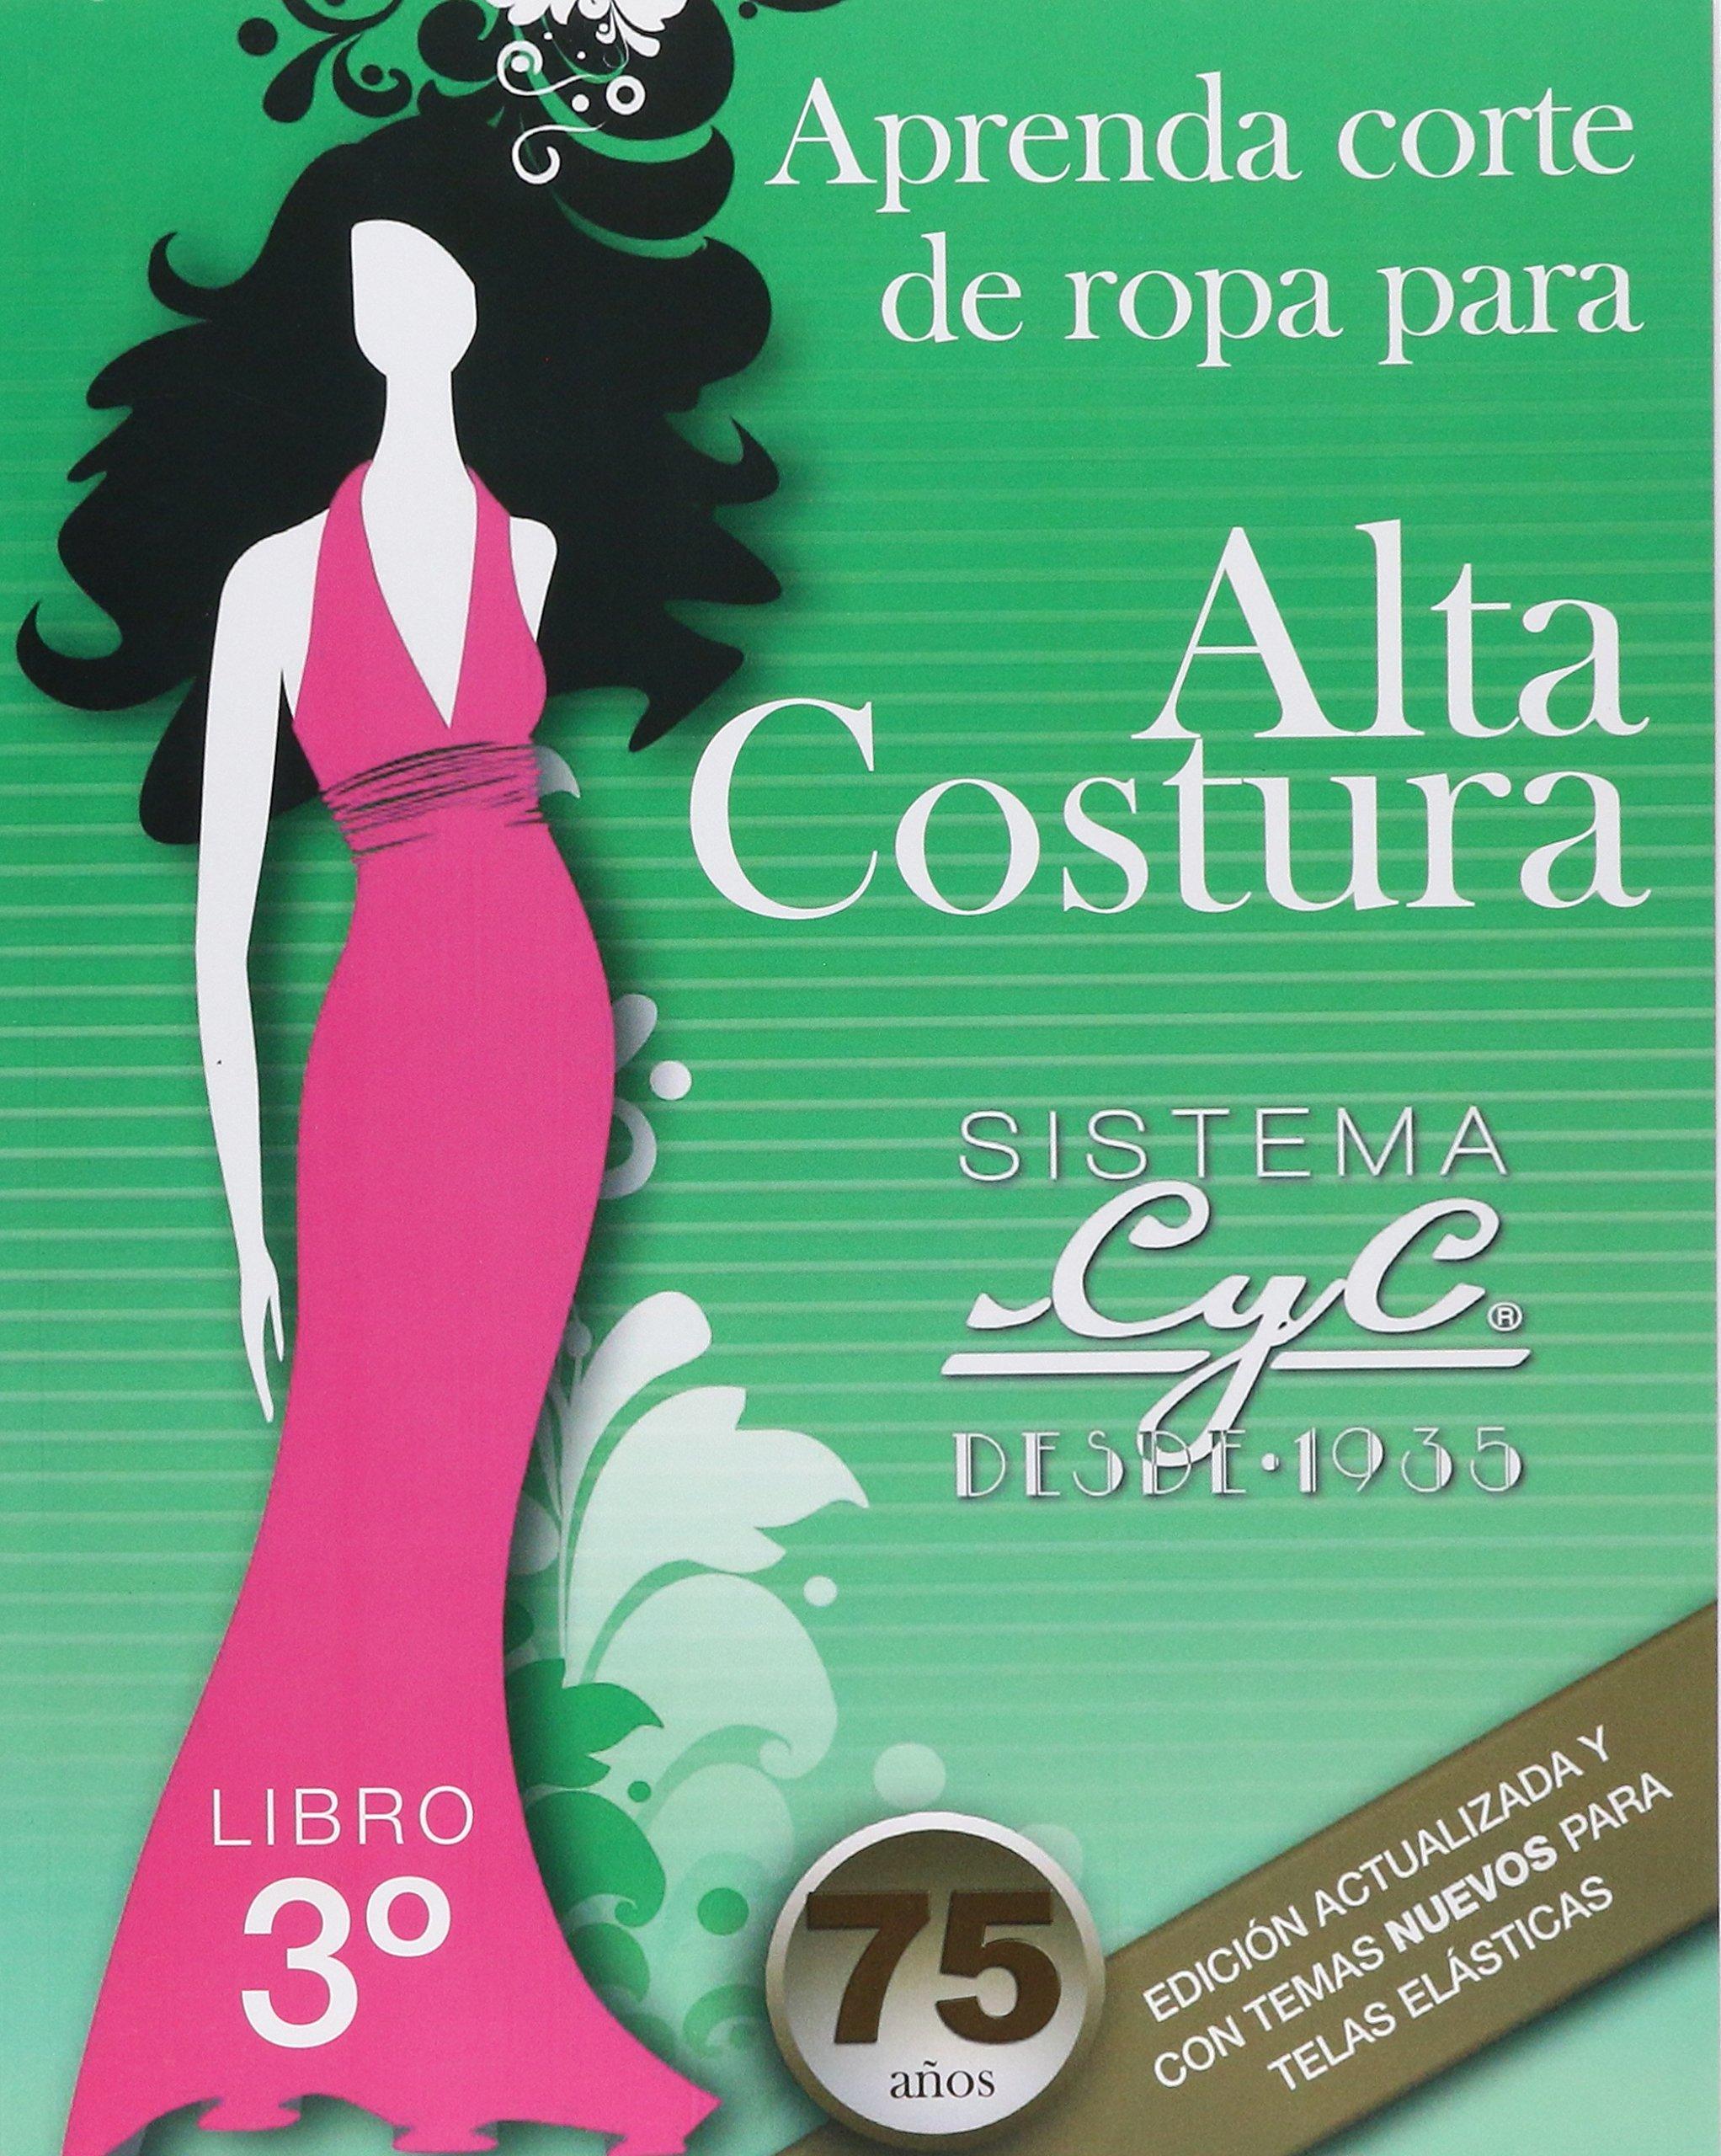 APRENDA CORTE DE ROPA PARA ALTA COSTURA 3 SISTEMA CYC. SECUNDARIA / 30 ED.: GUADALUPE F. COUTO ARENAS: 9789709284928: Amazon.com: Books